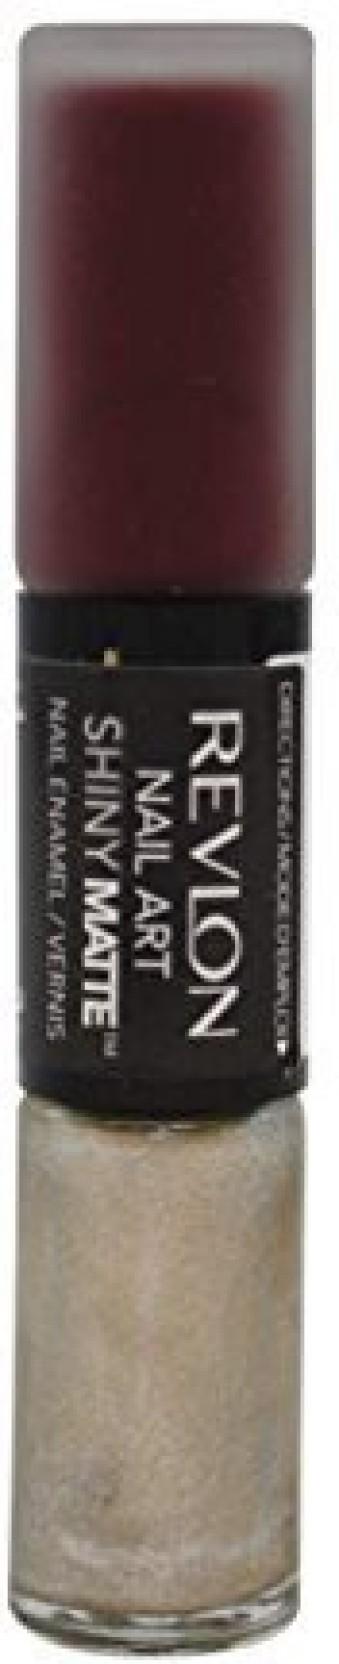 Revlon Nail Art Shiny Matte Tortoiseshell Price In India Buy